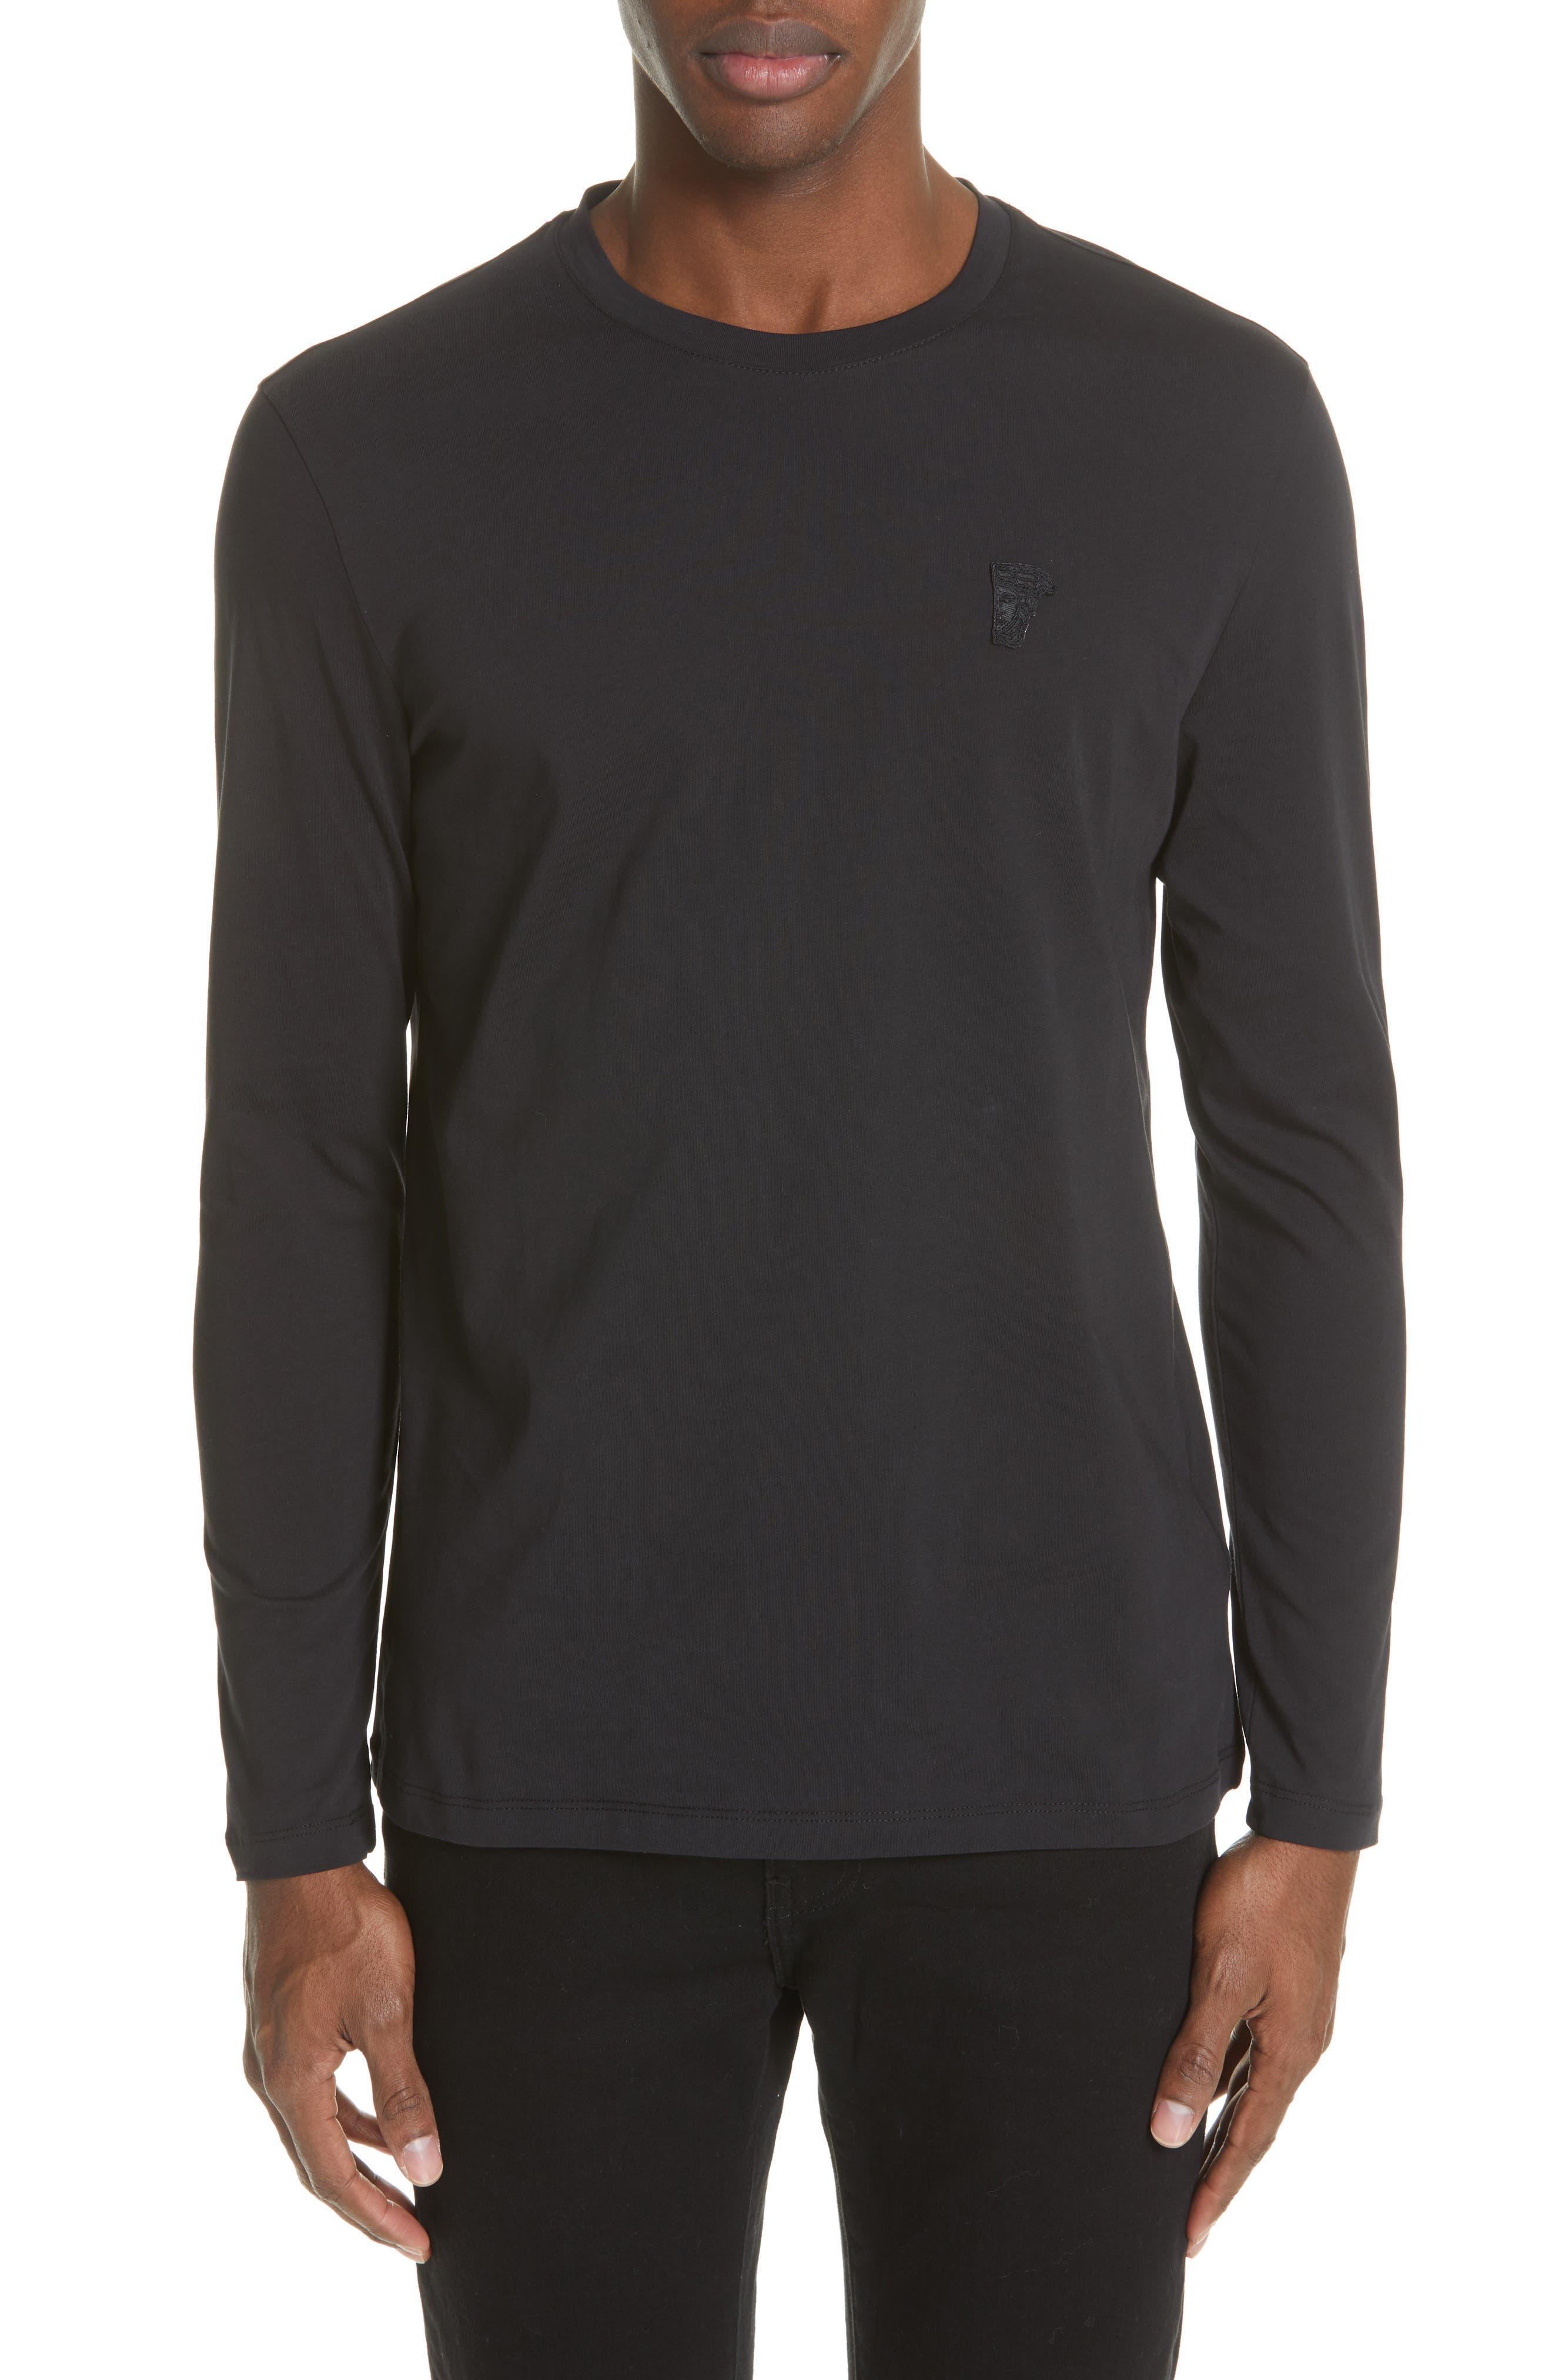 VERSACE COLLECTION, Medusa Long Sleeve T-Shirt, Main thumbnail 1, color, 001